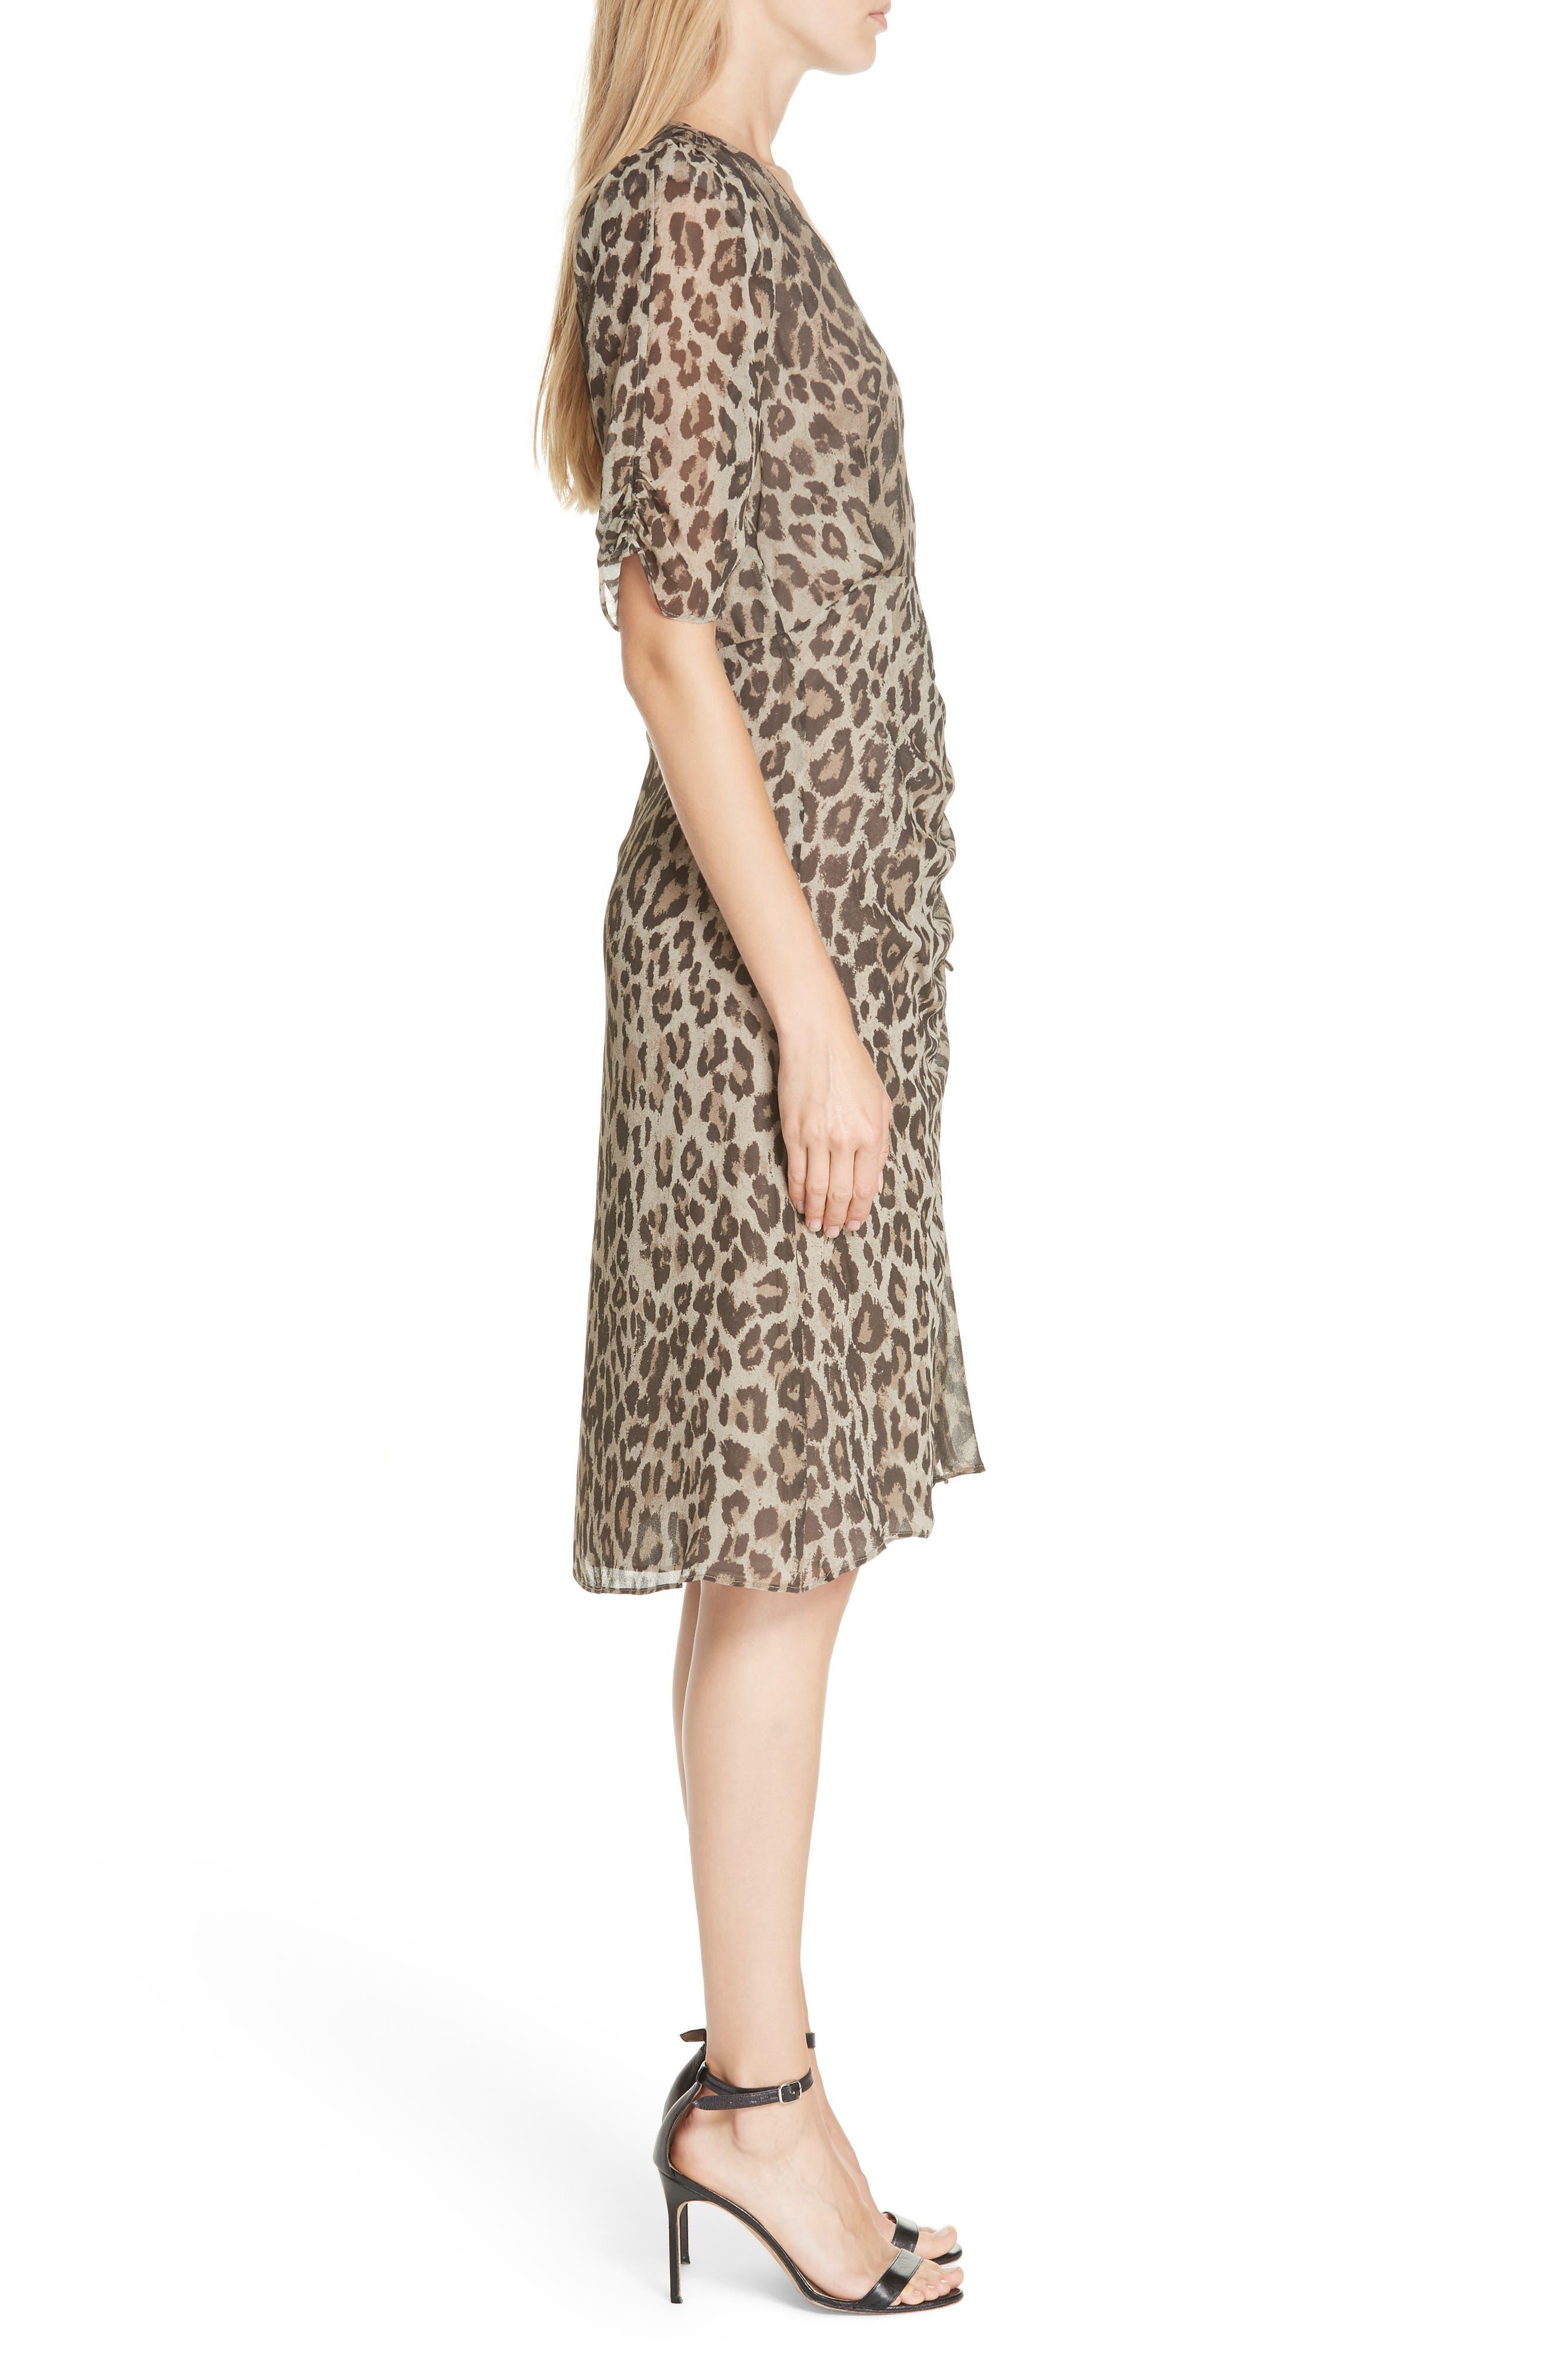 NICHOLAS, Ruched Leopard Print Silk Dress, Alternate thumbnail 3, color, 200